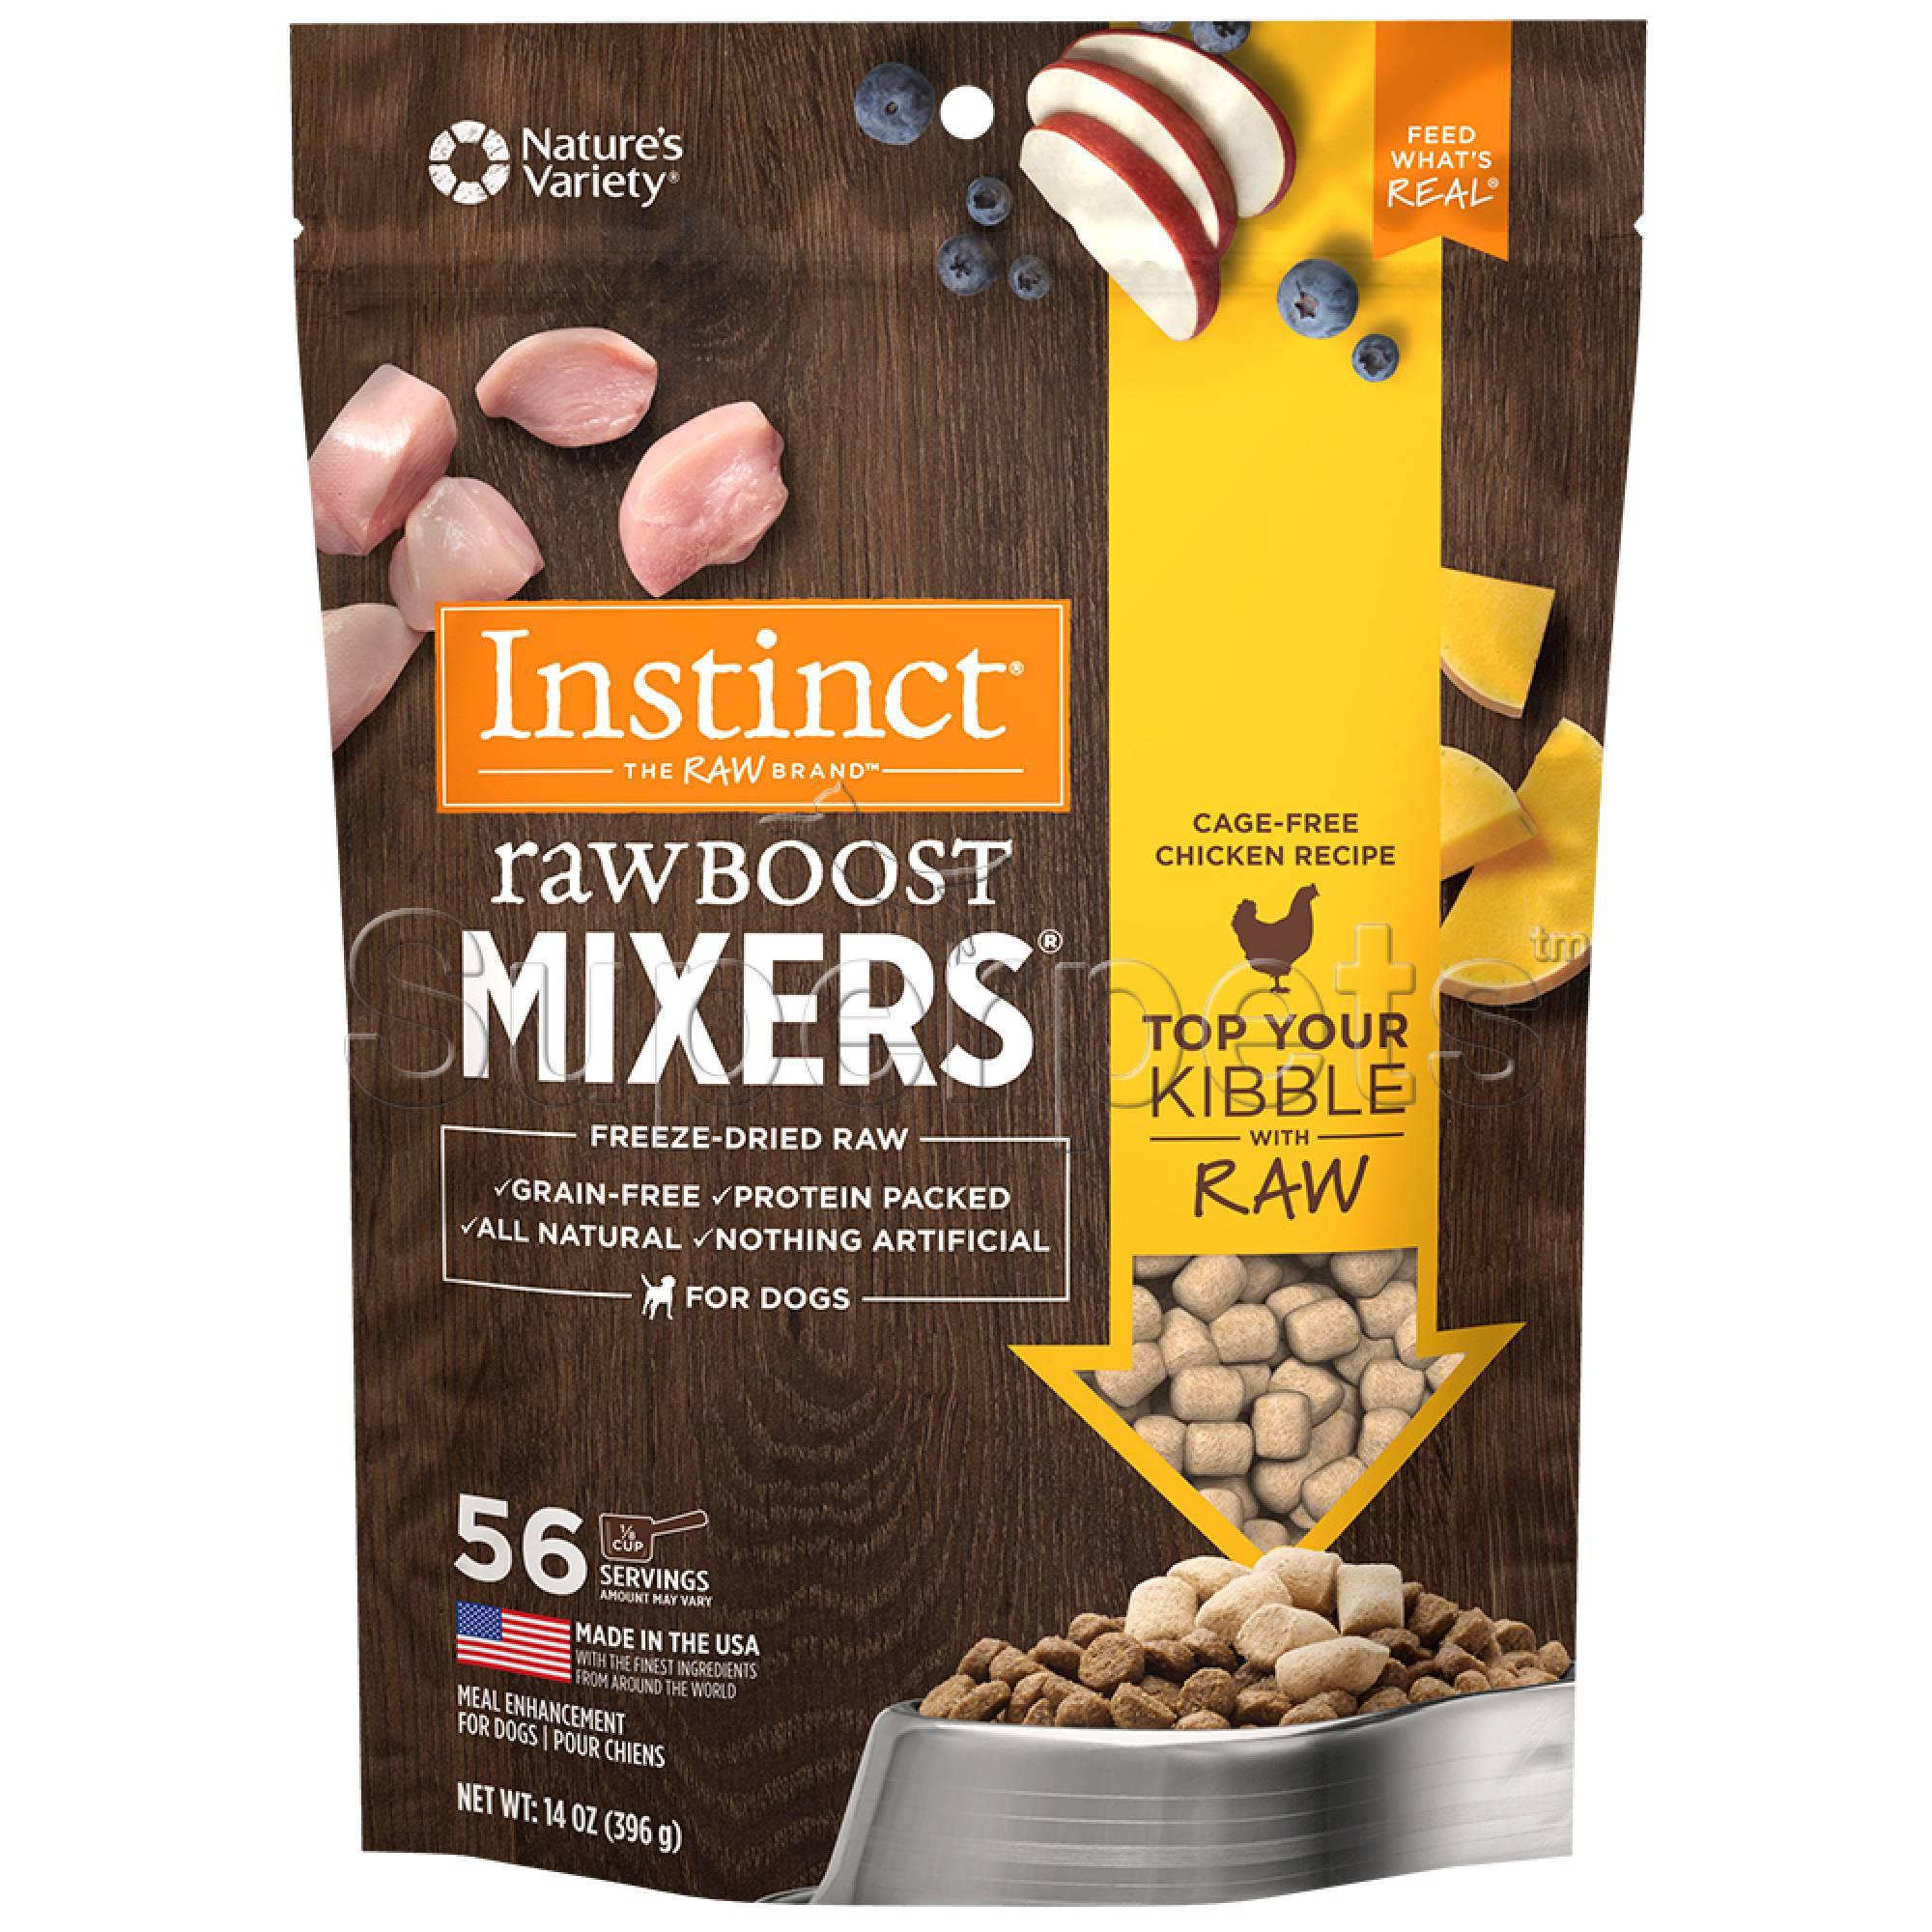 Instinct - Dog Freeze-Dried Raw Boost Mixers Grain-Free Chicken 14oz (397g)